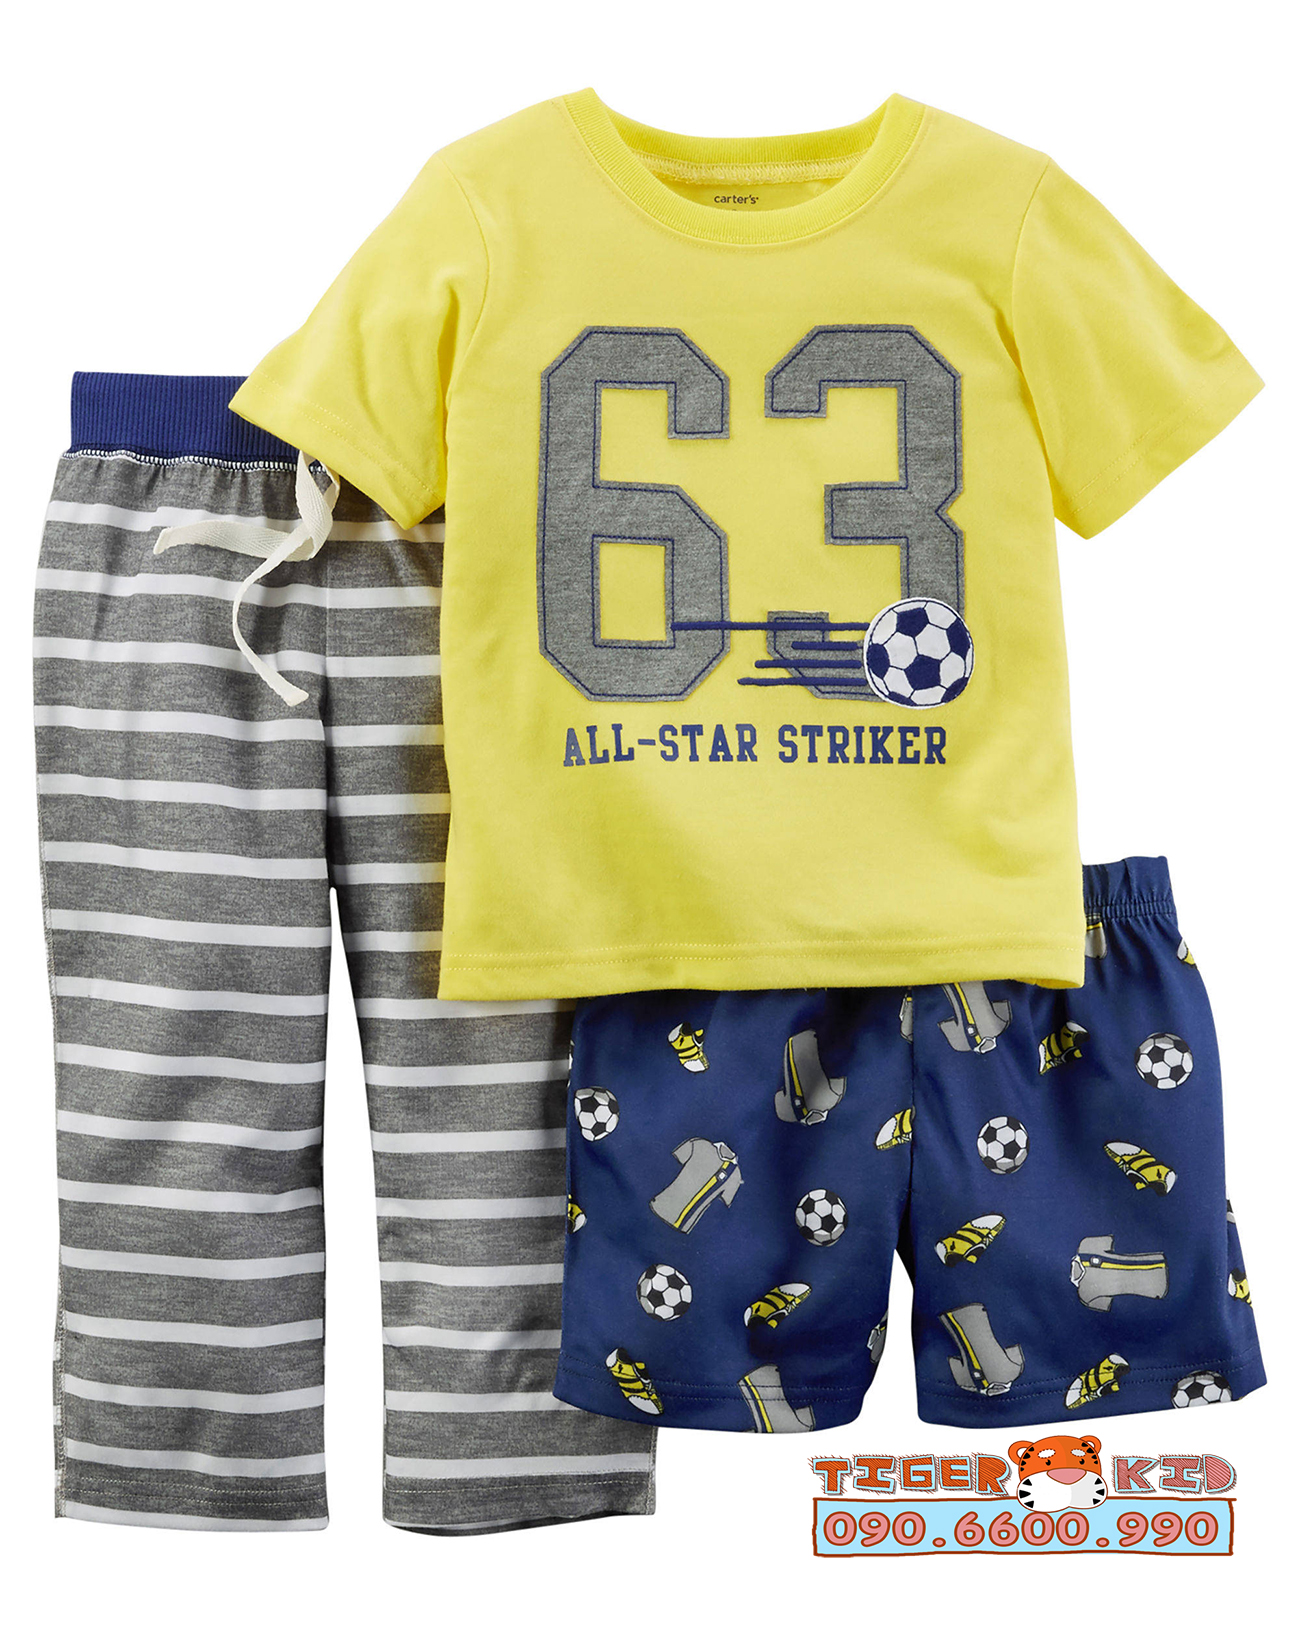 28262740636 5e176a0225 o Bộ set Pijamas 12M 18M 24M